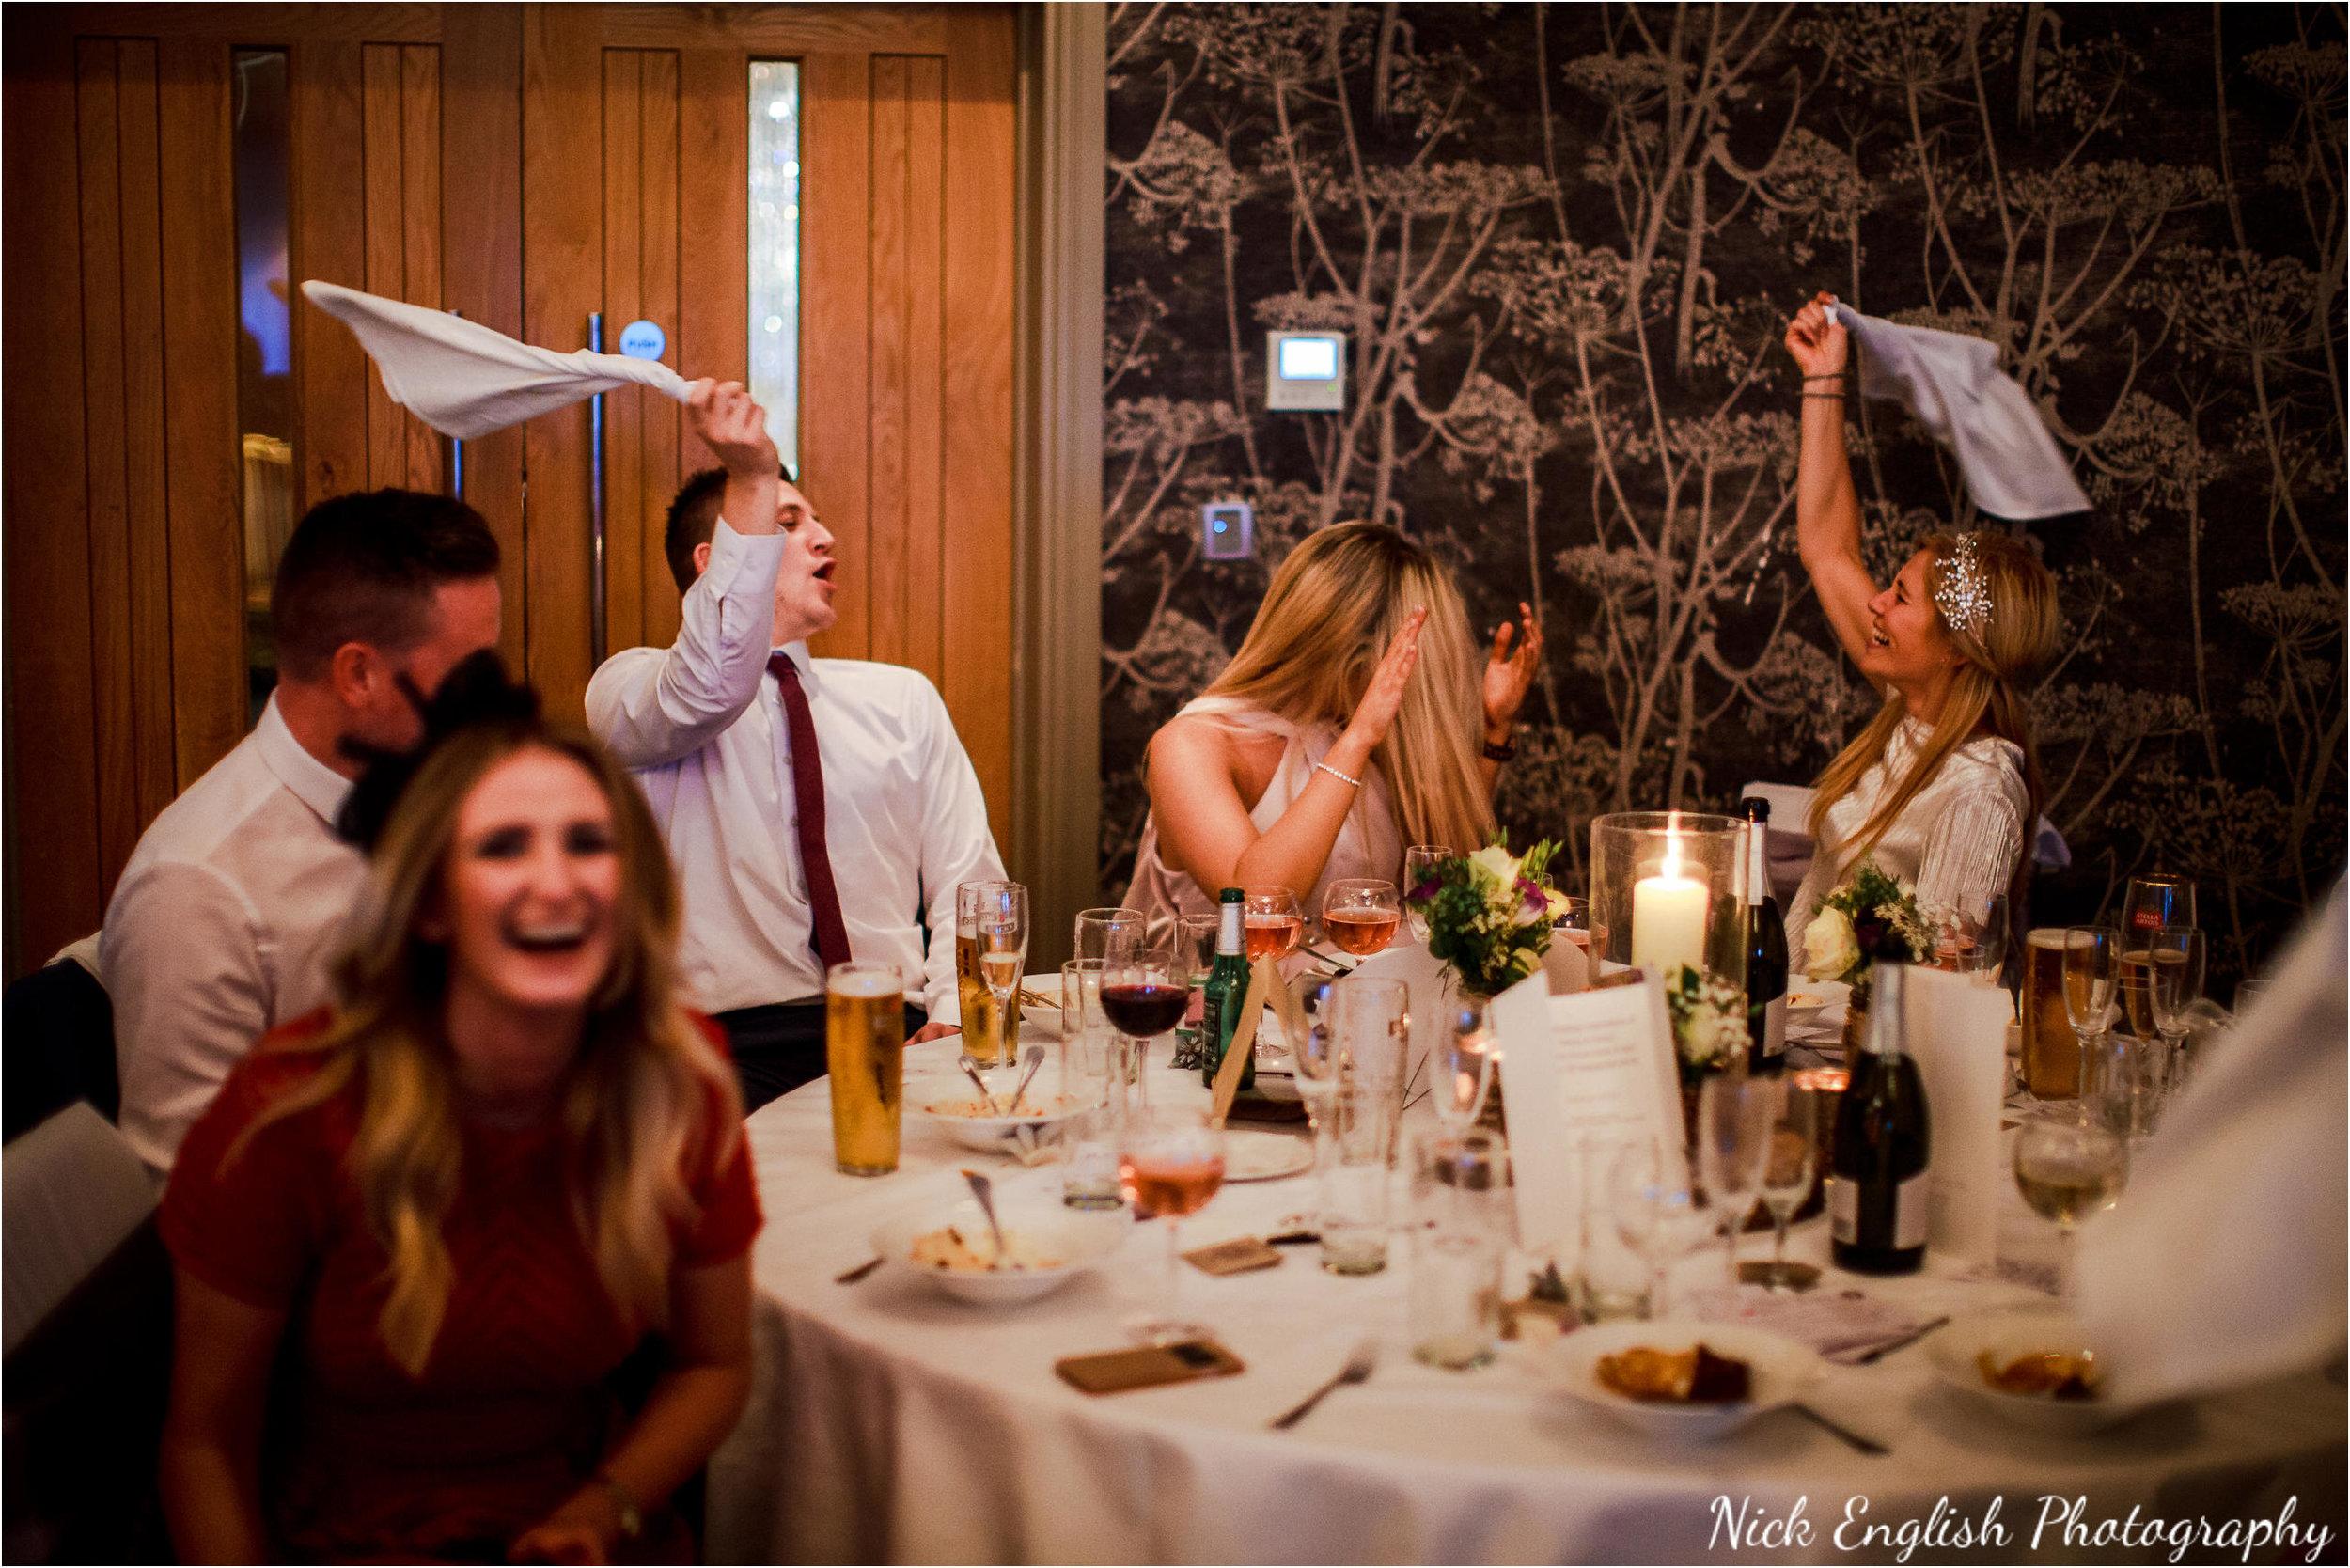 Stacey-Ash-Wedding-Photographs-Stanley-House-Preston-Lancashire-200.jpg